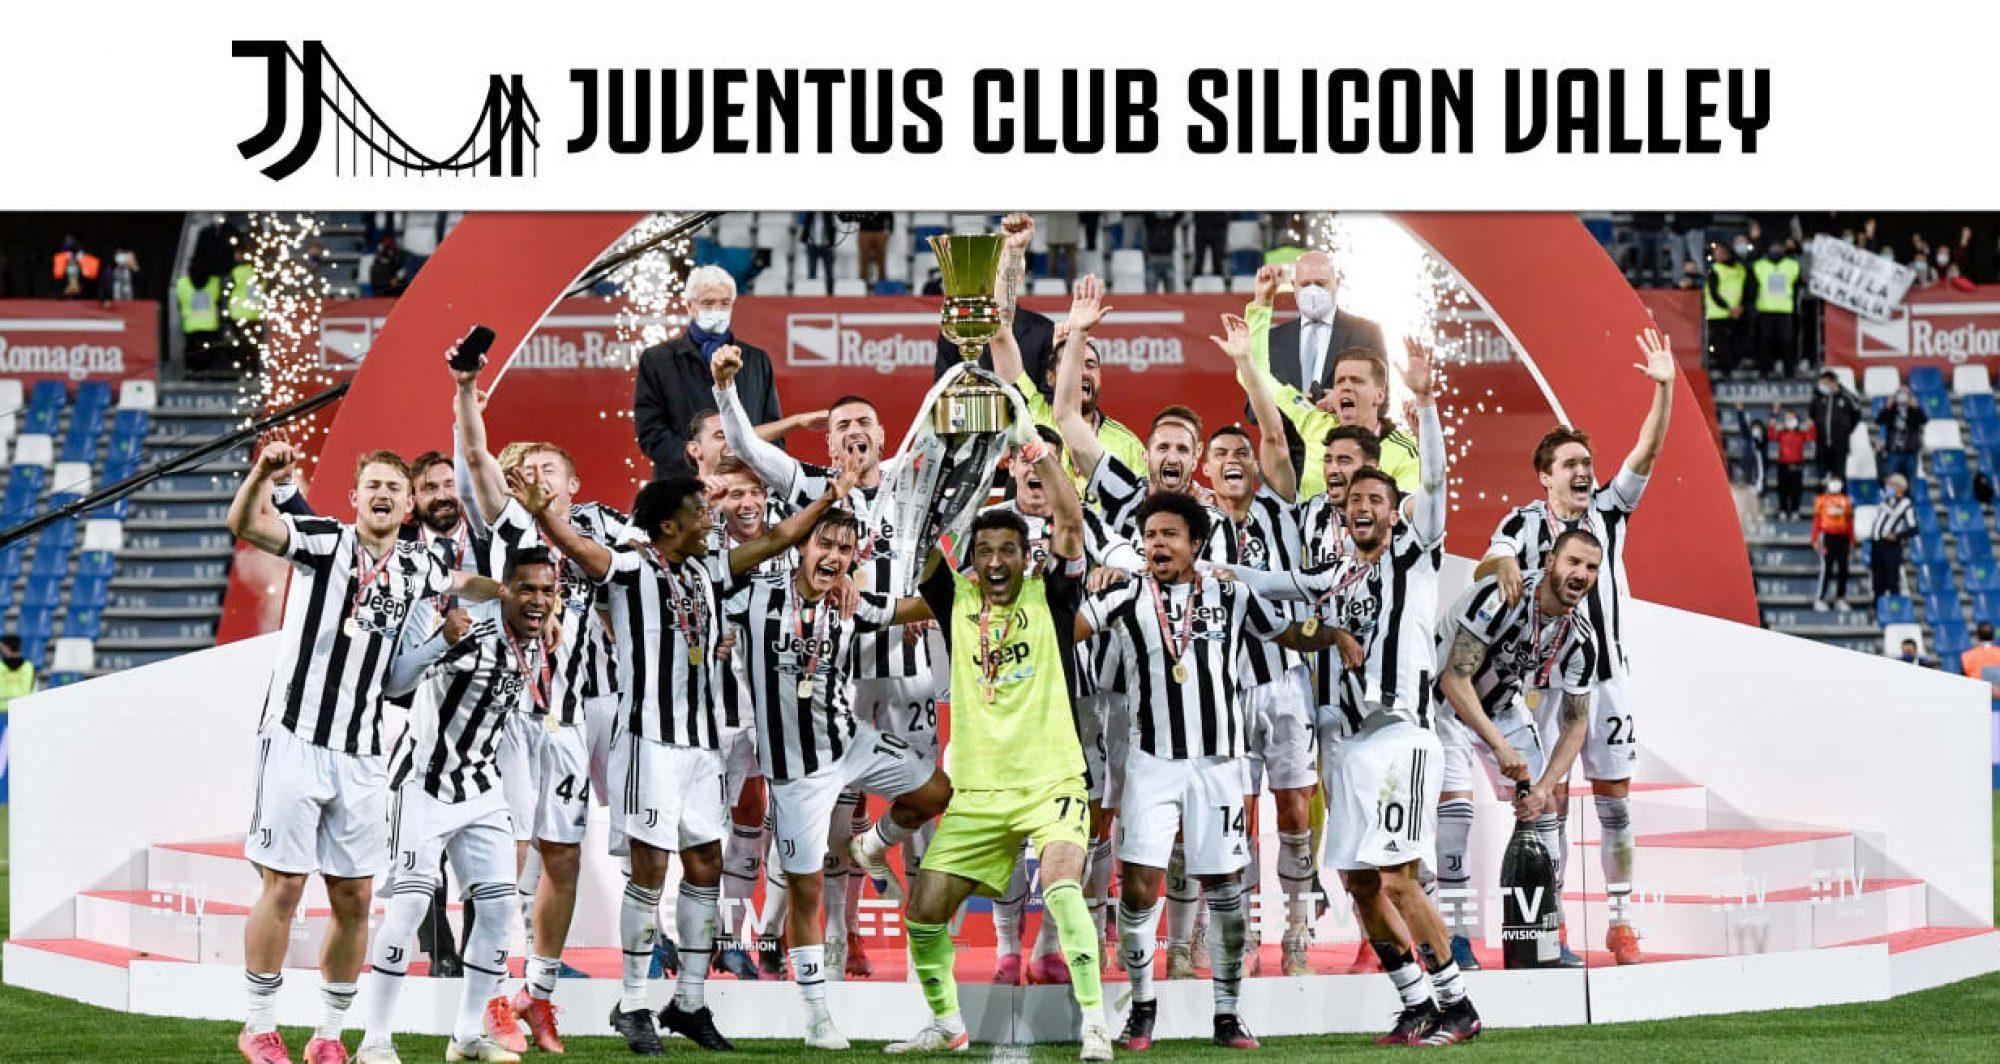 Juventus Club Silicon Valley